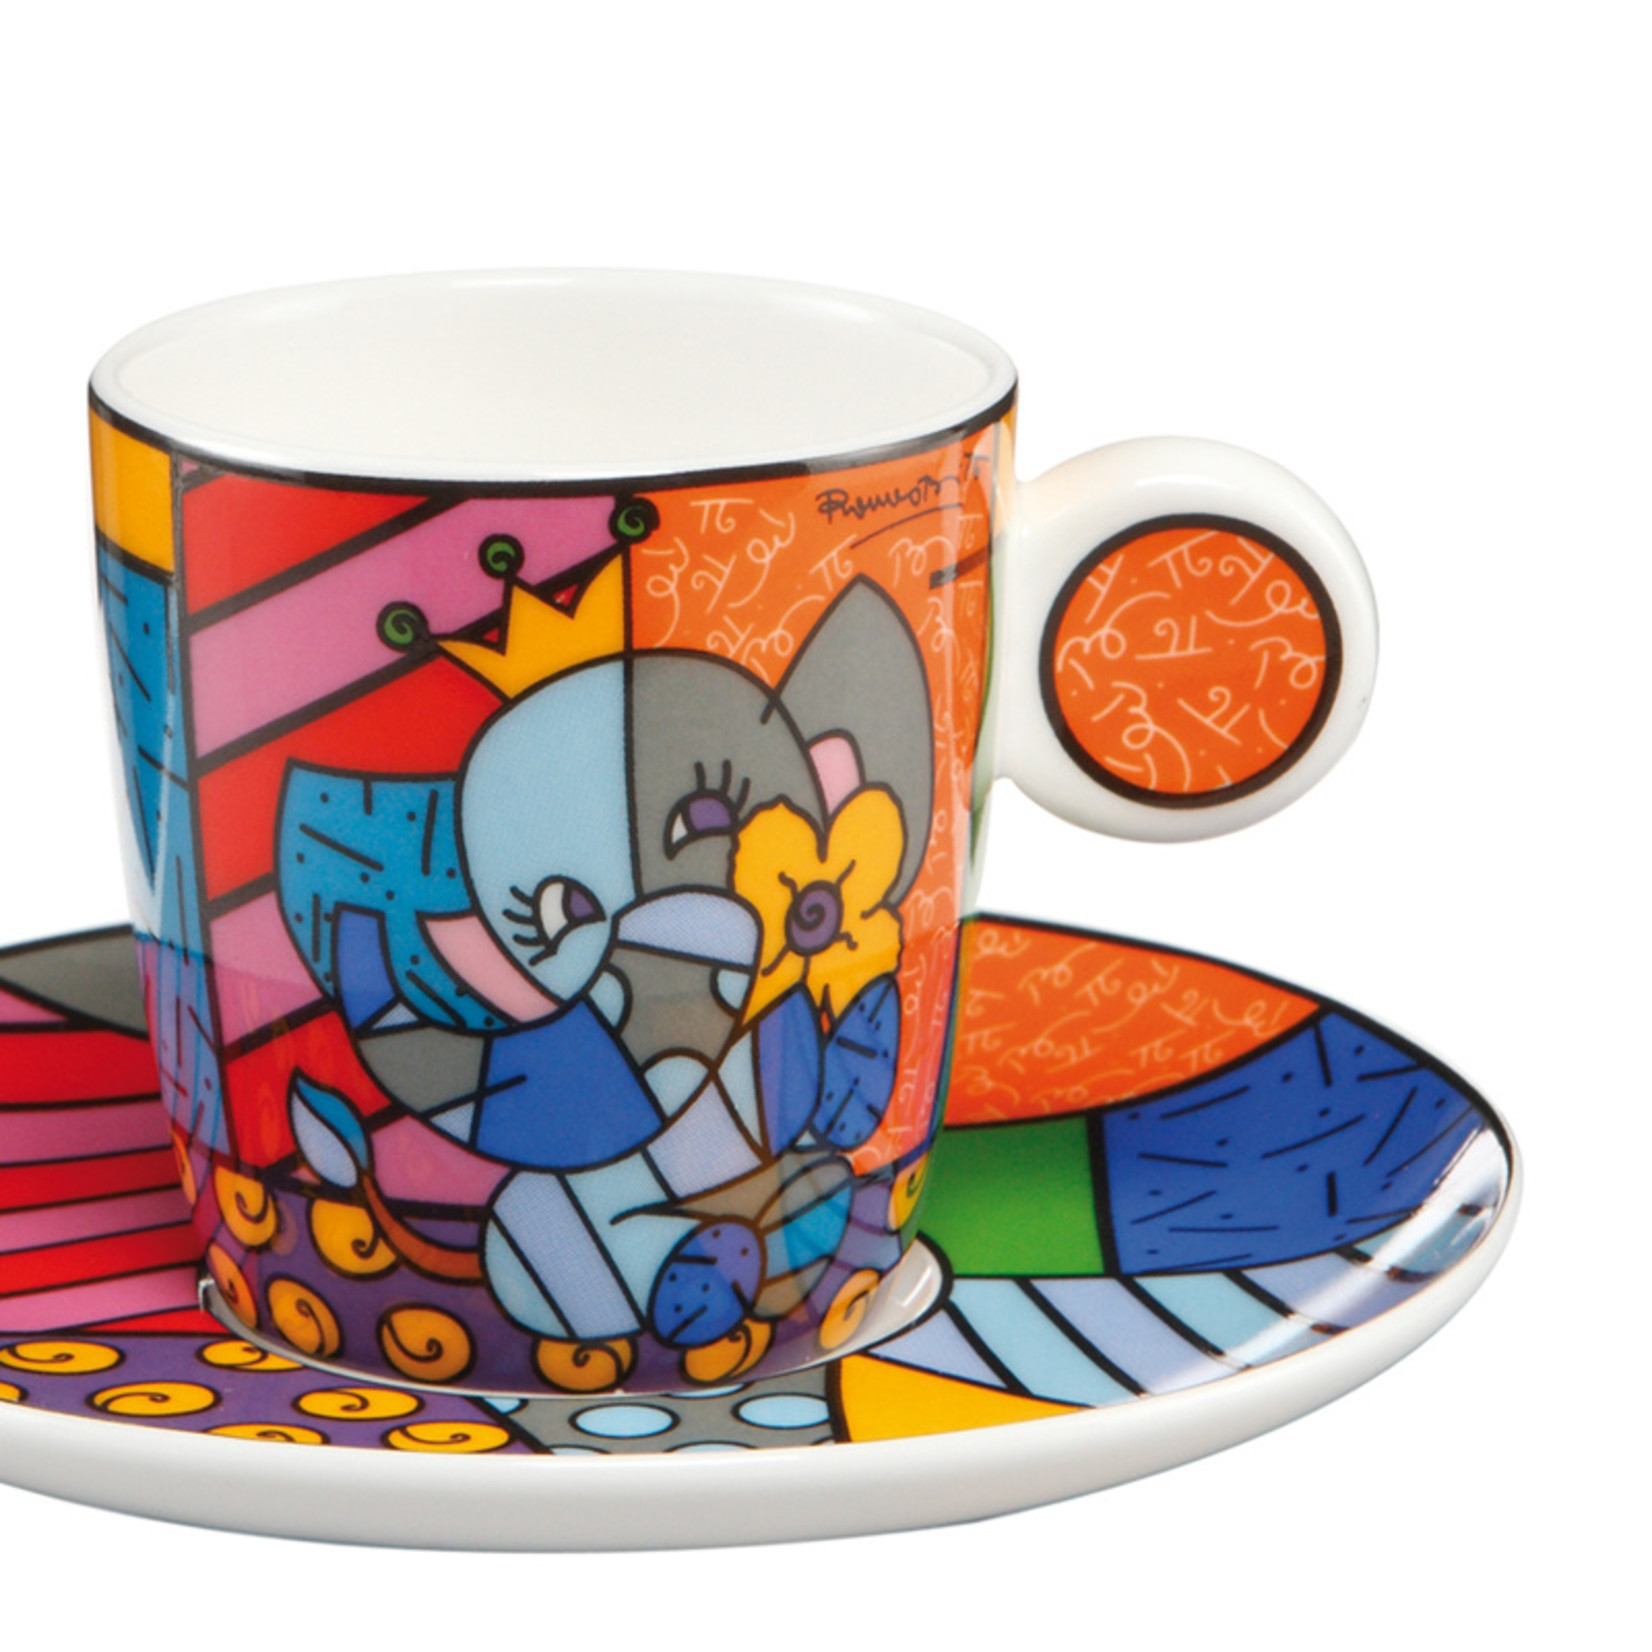 Goebel Porzellanmanufaktur Espressotasse Spring Elephant   Romero Britto   Goebel Porzellan